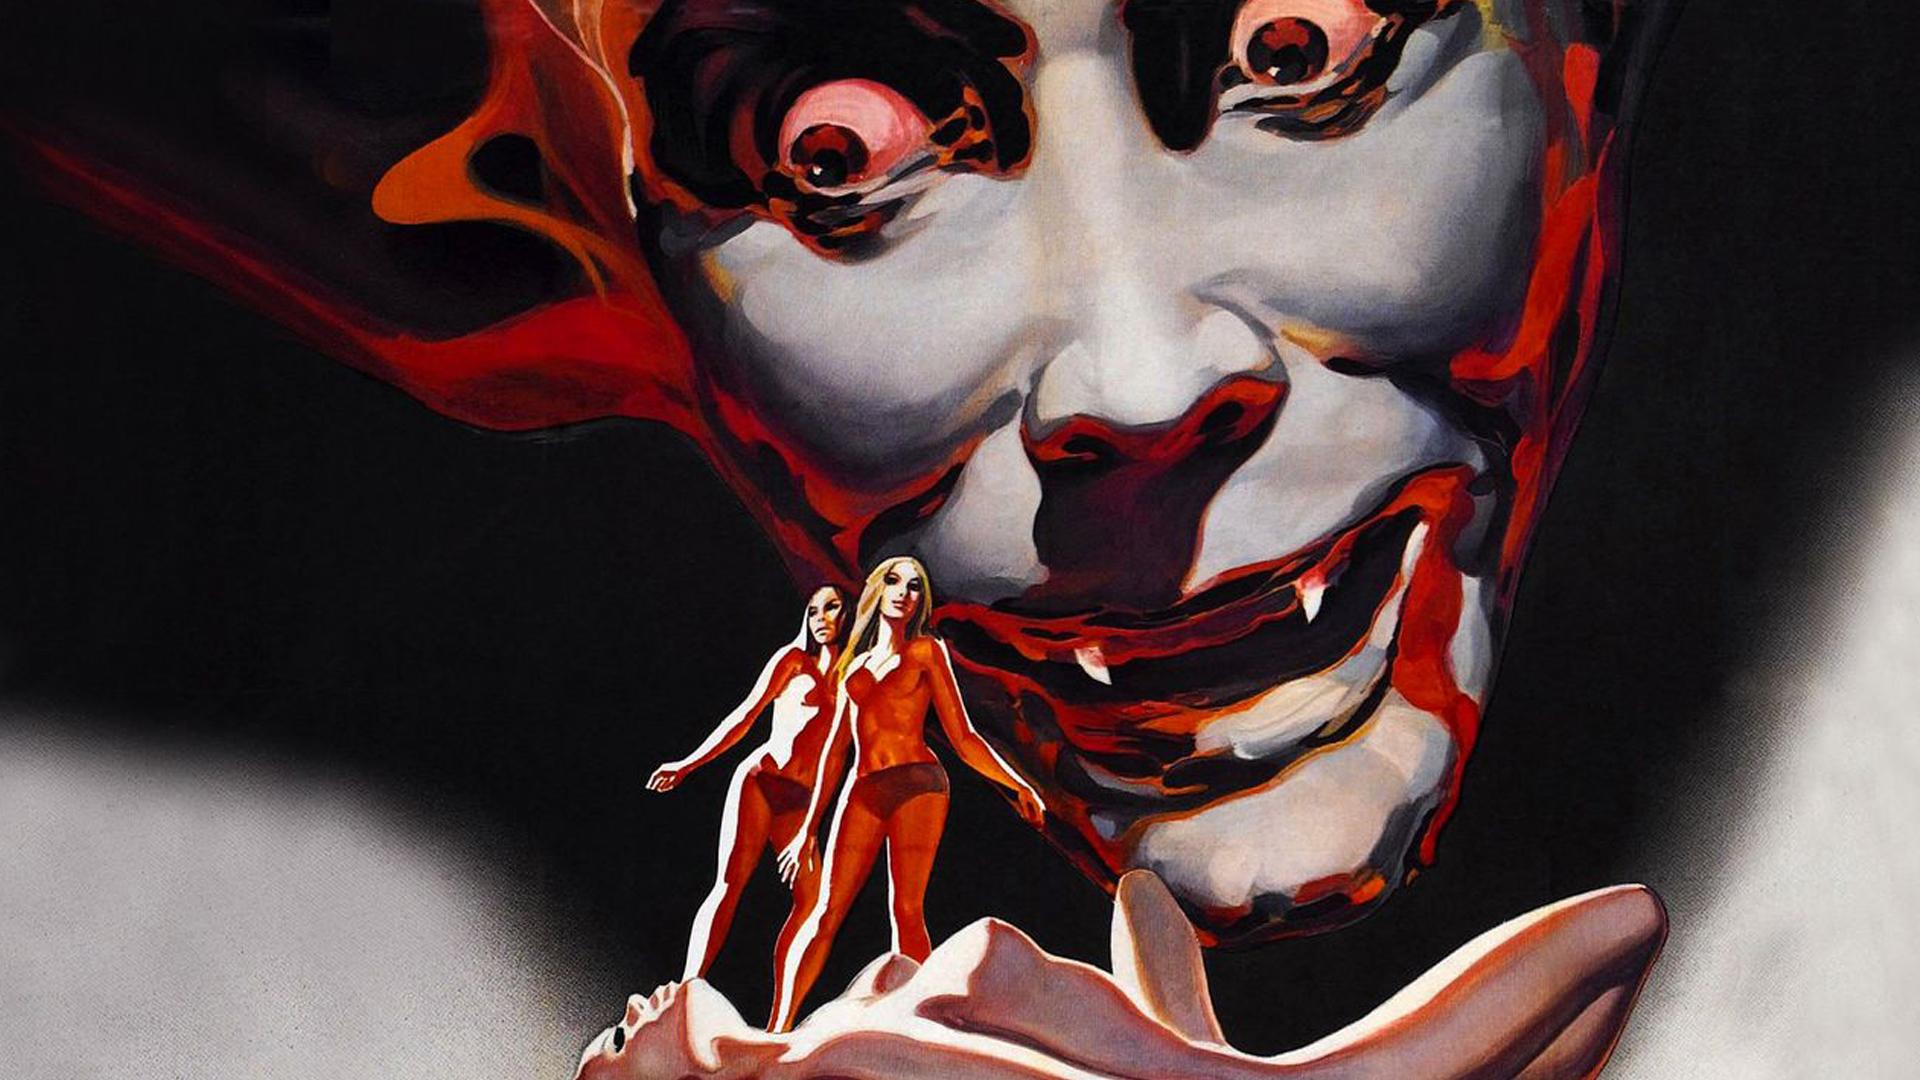 Exposition Vampires